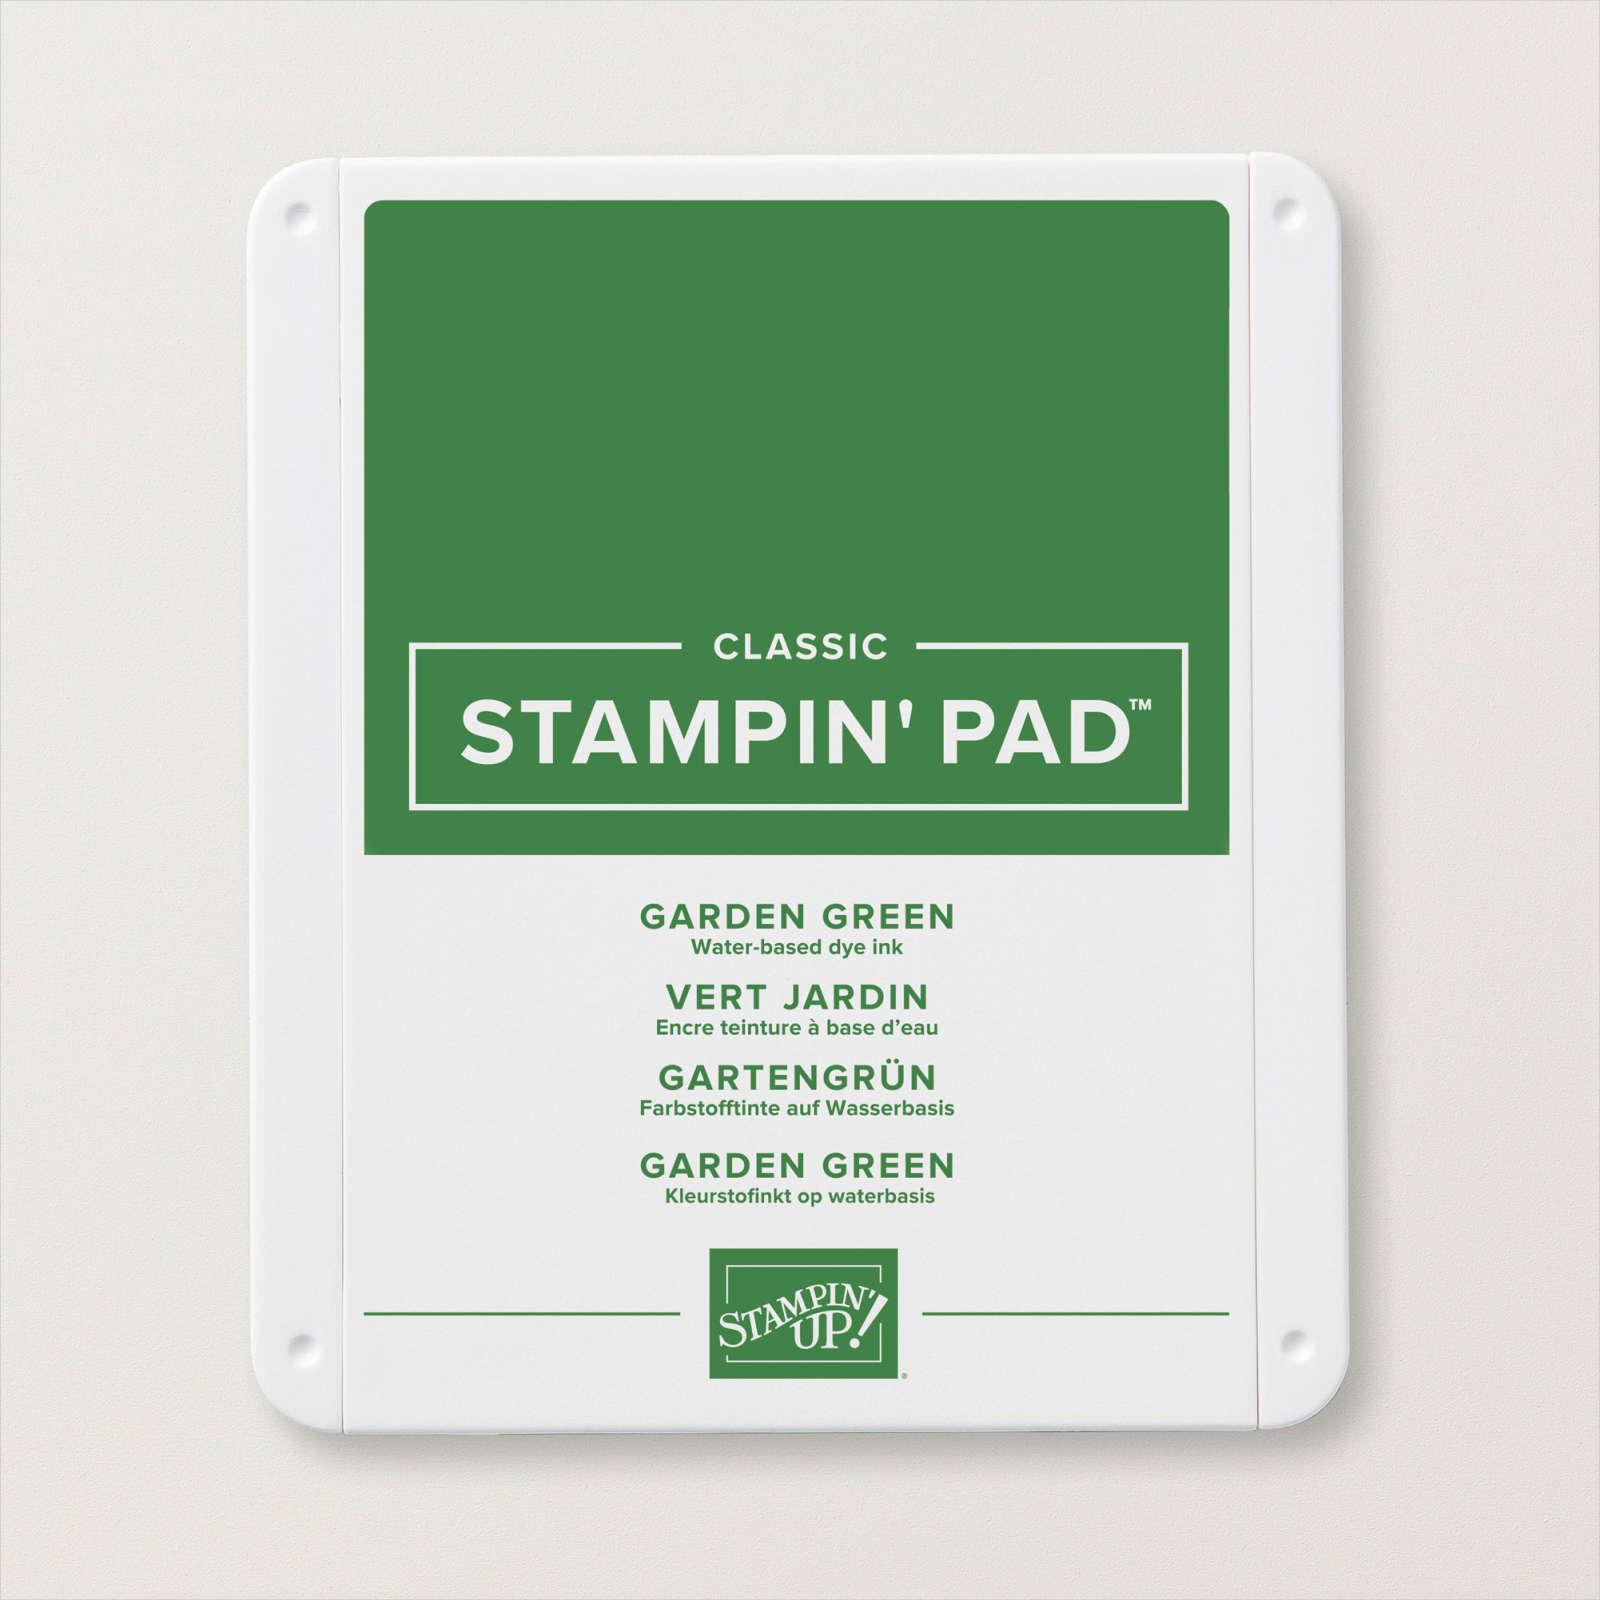 Stampin'pad Vert jardin